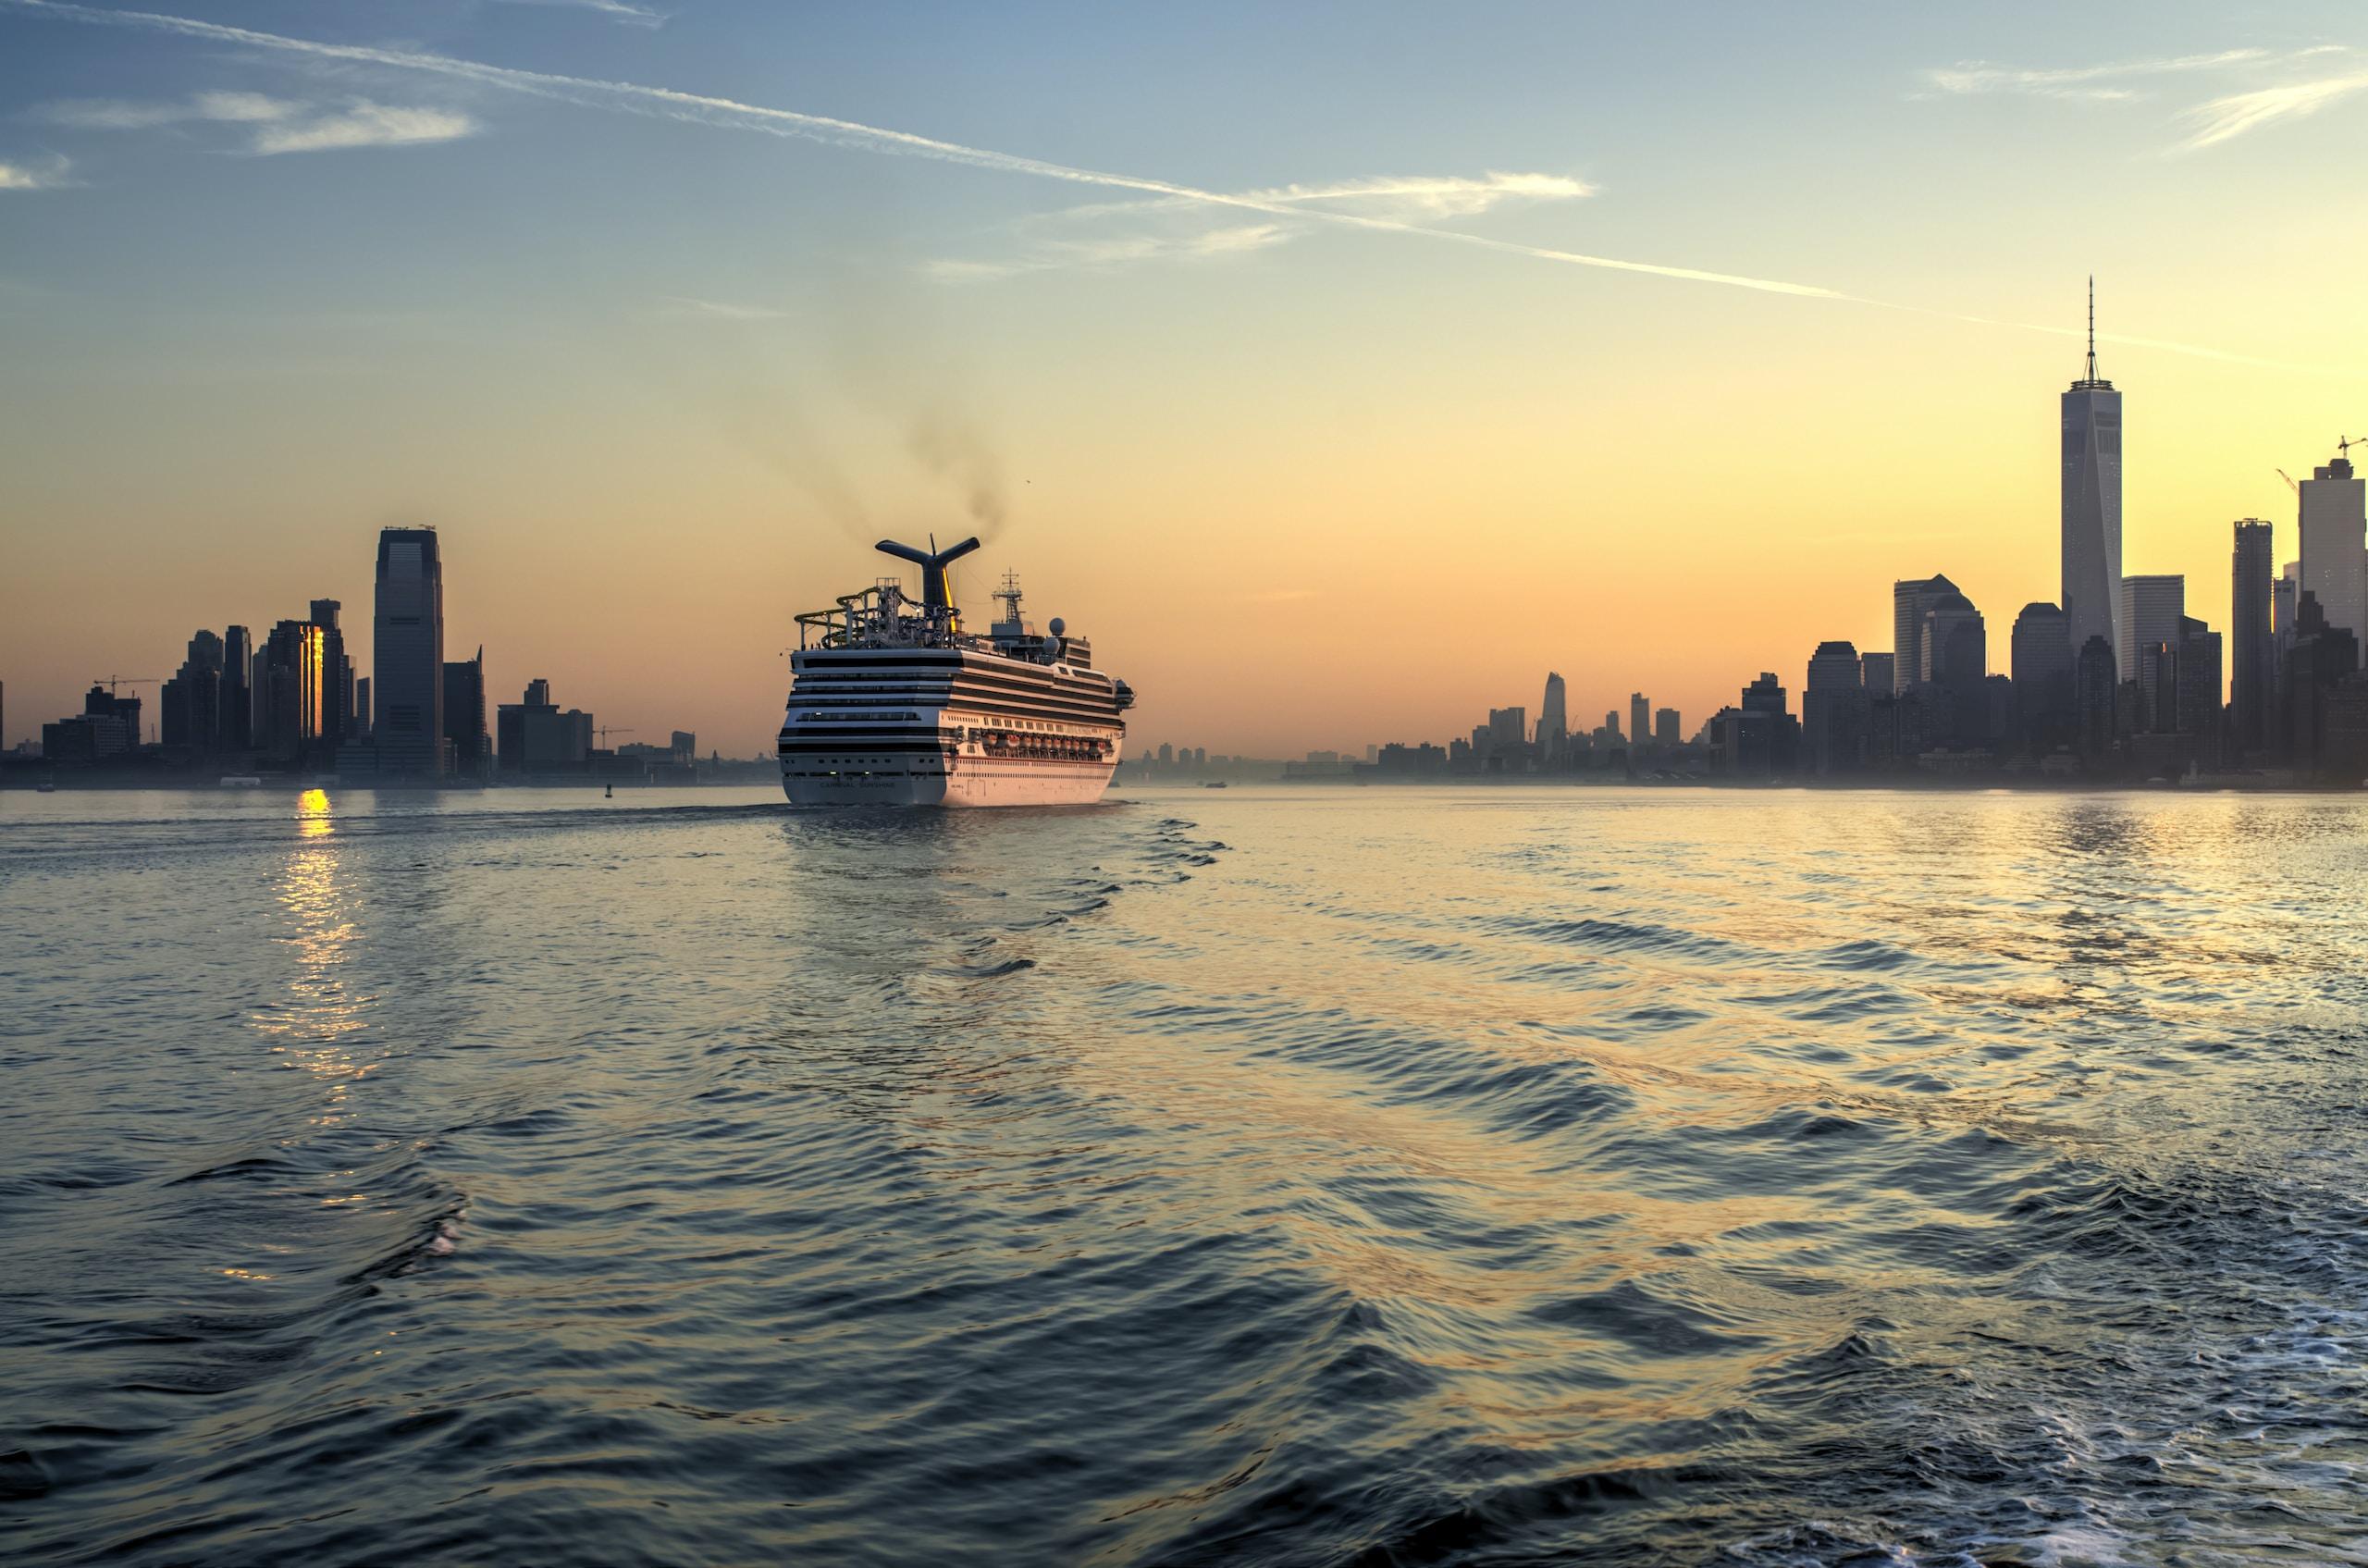 Ocean Cruising or River Cruising?